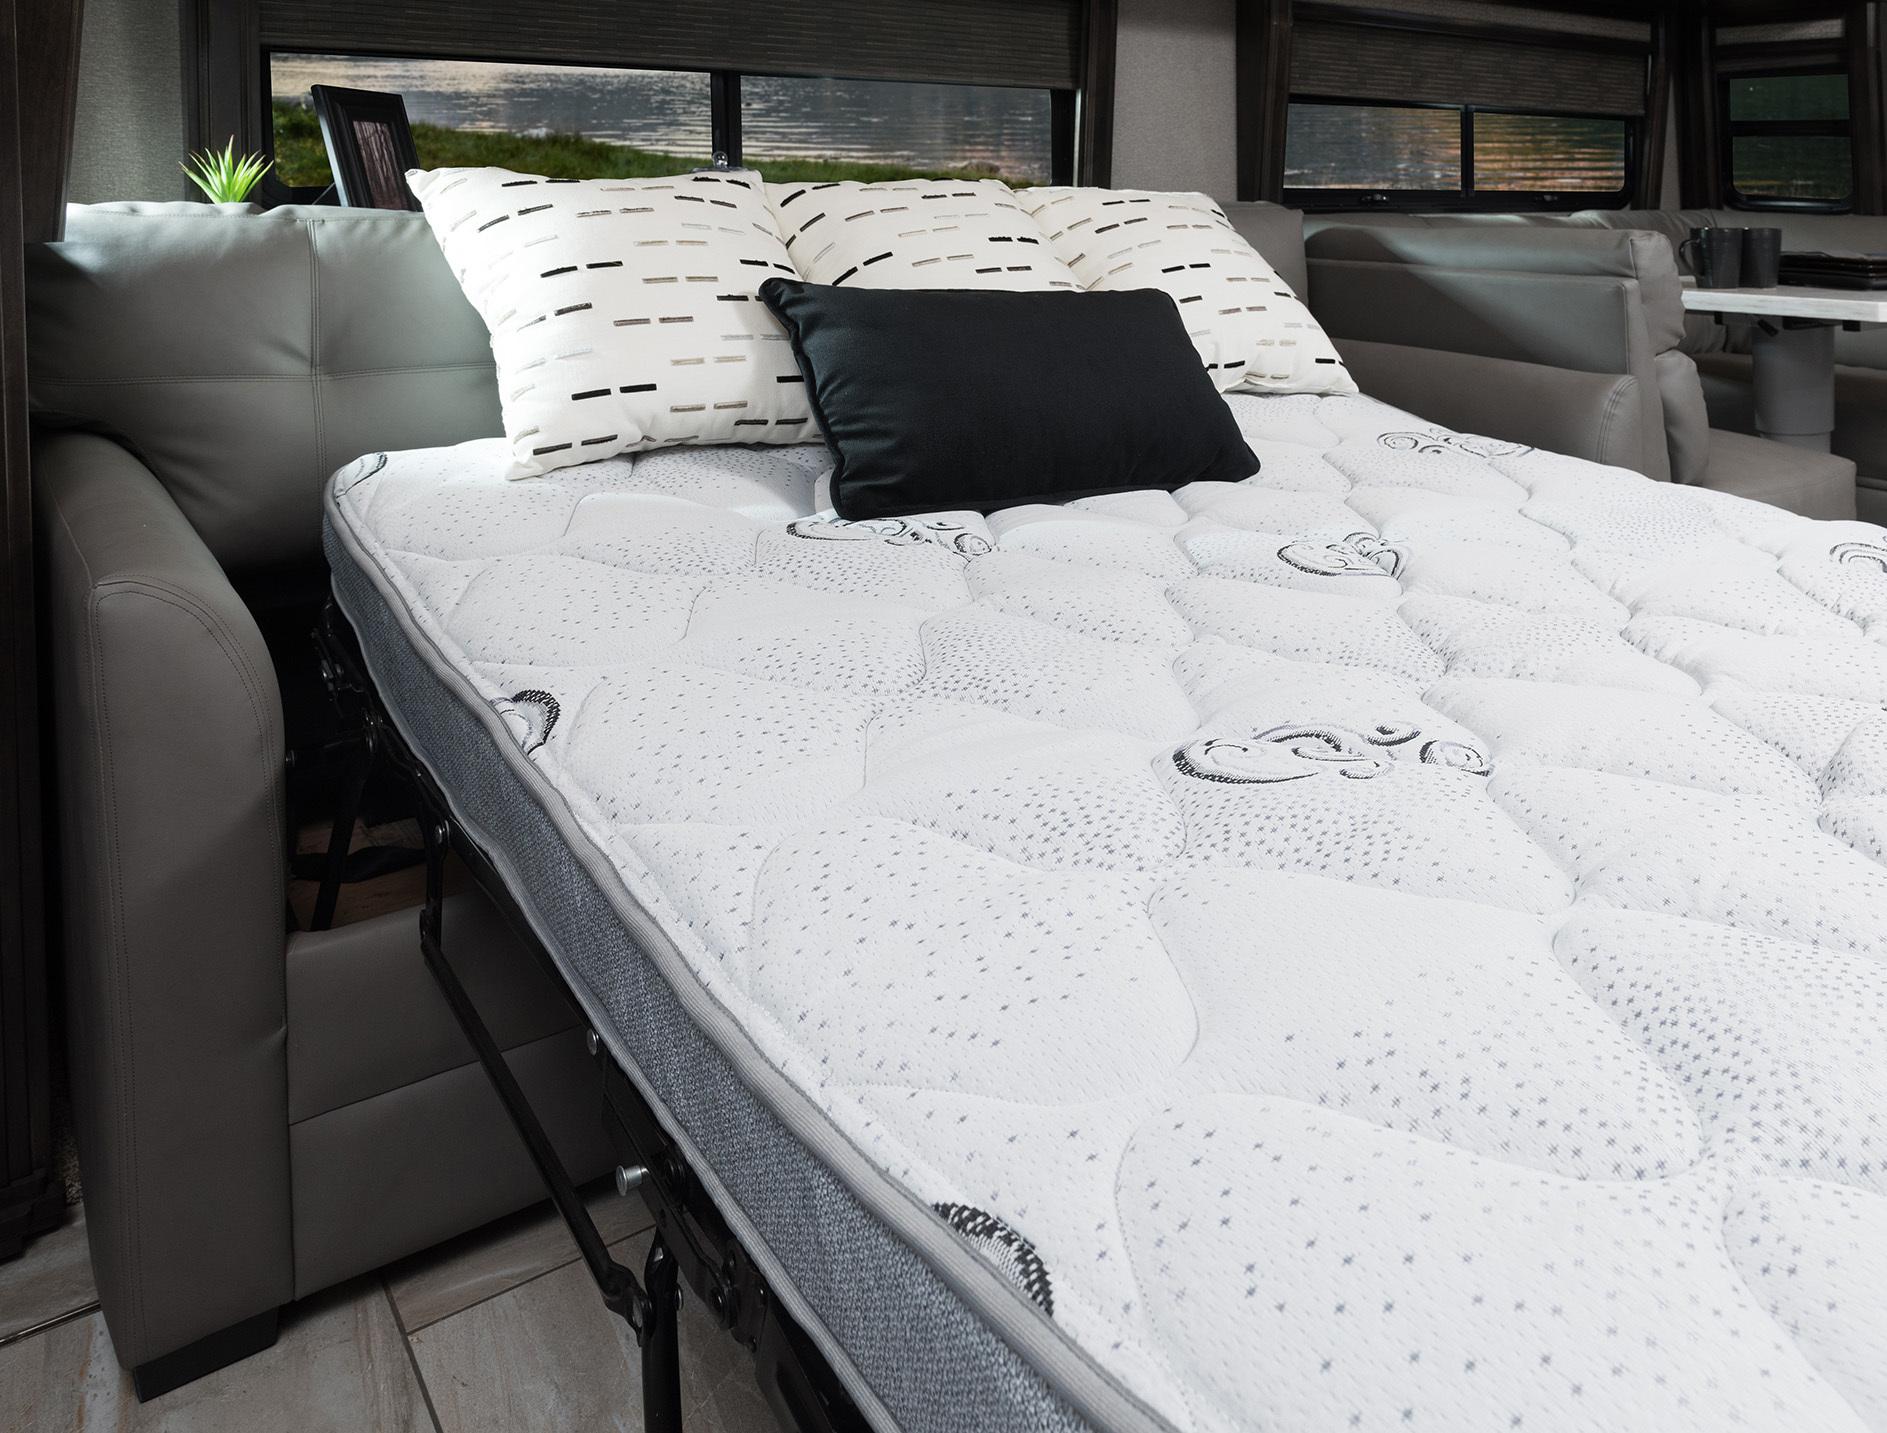 5 sofabed 42 V REV Silverston Dorian1661